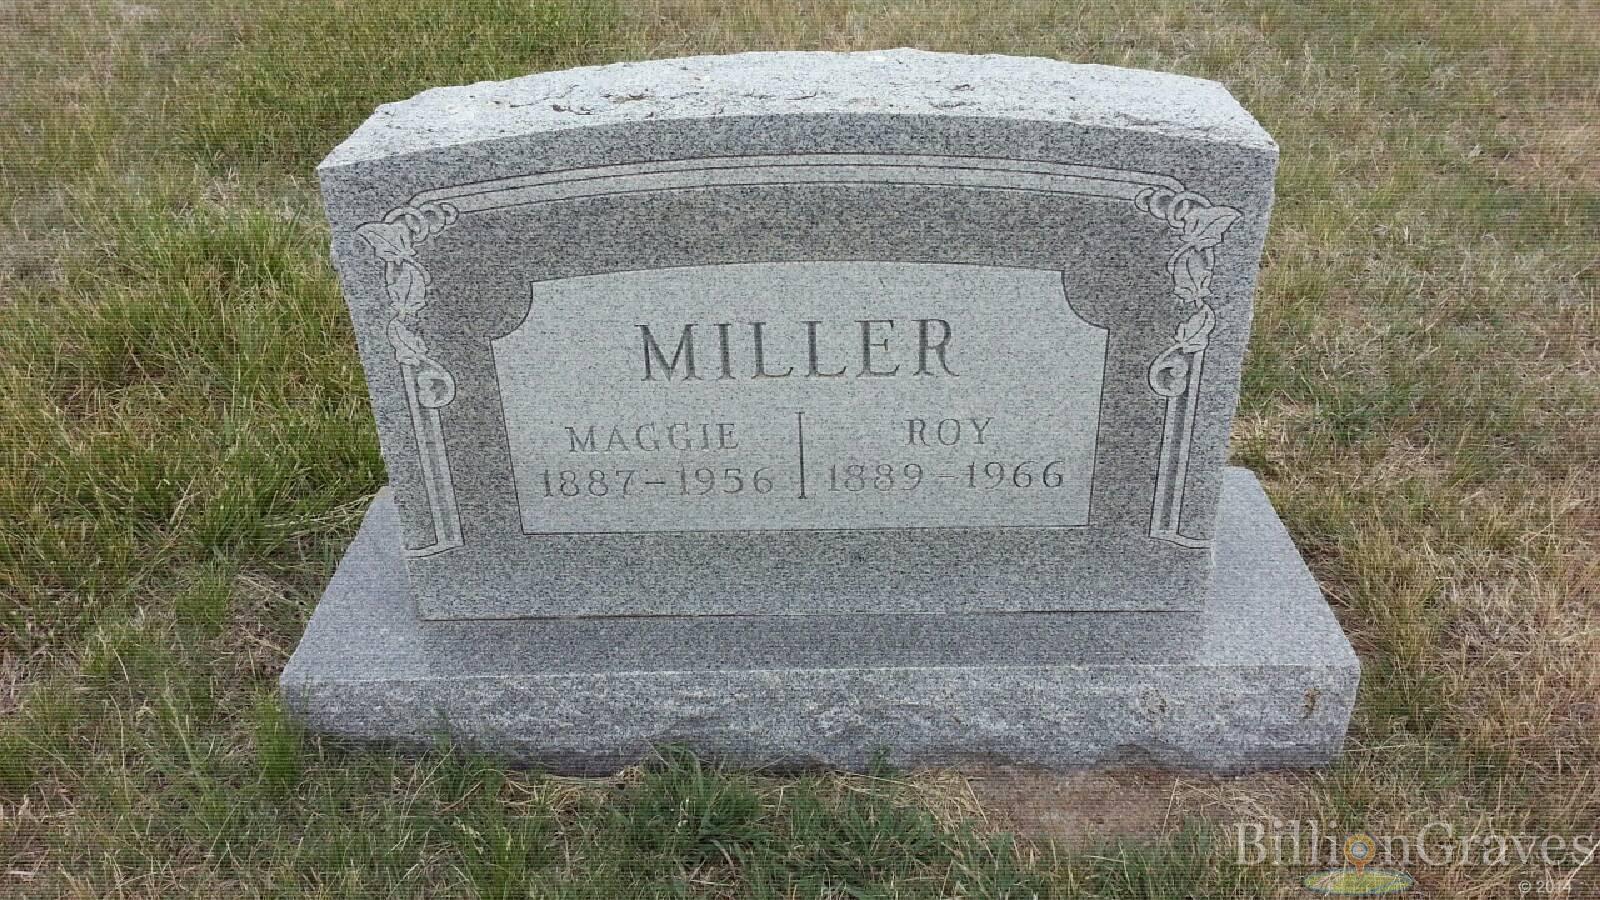 grave site of maggie miller 1887 1956 billiongraves headstone image of maggie miller